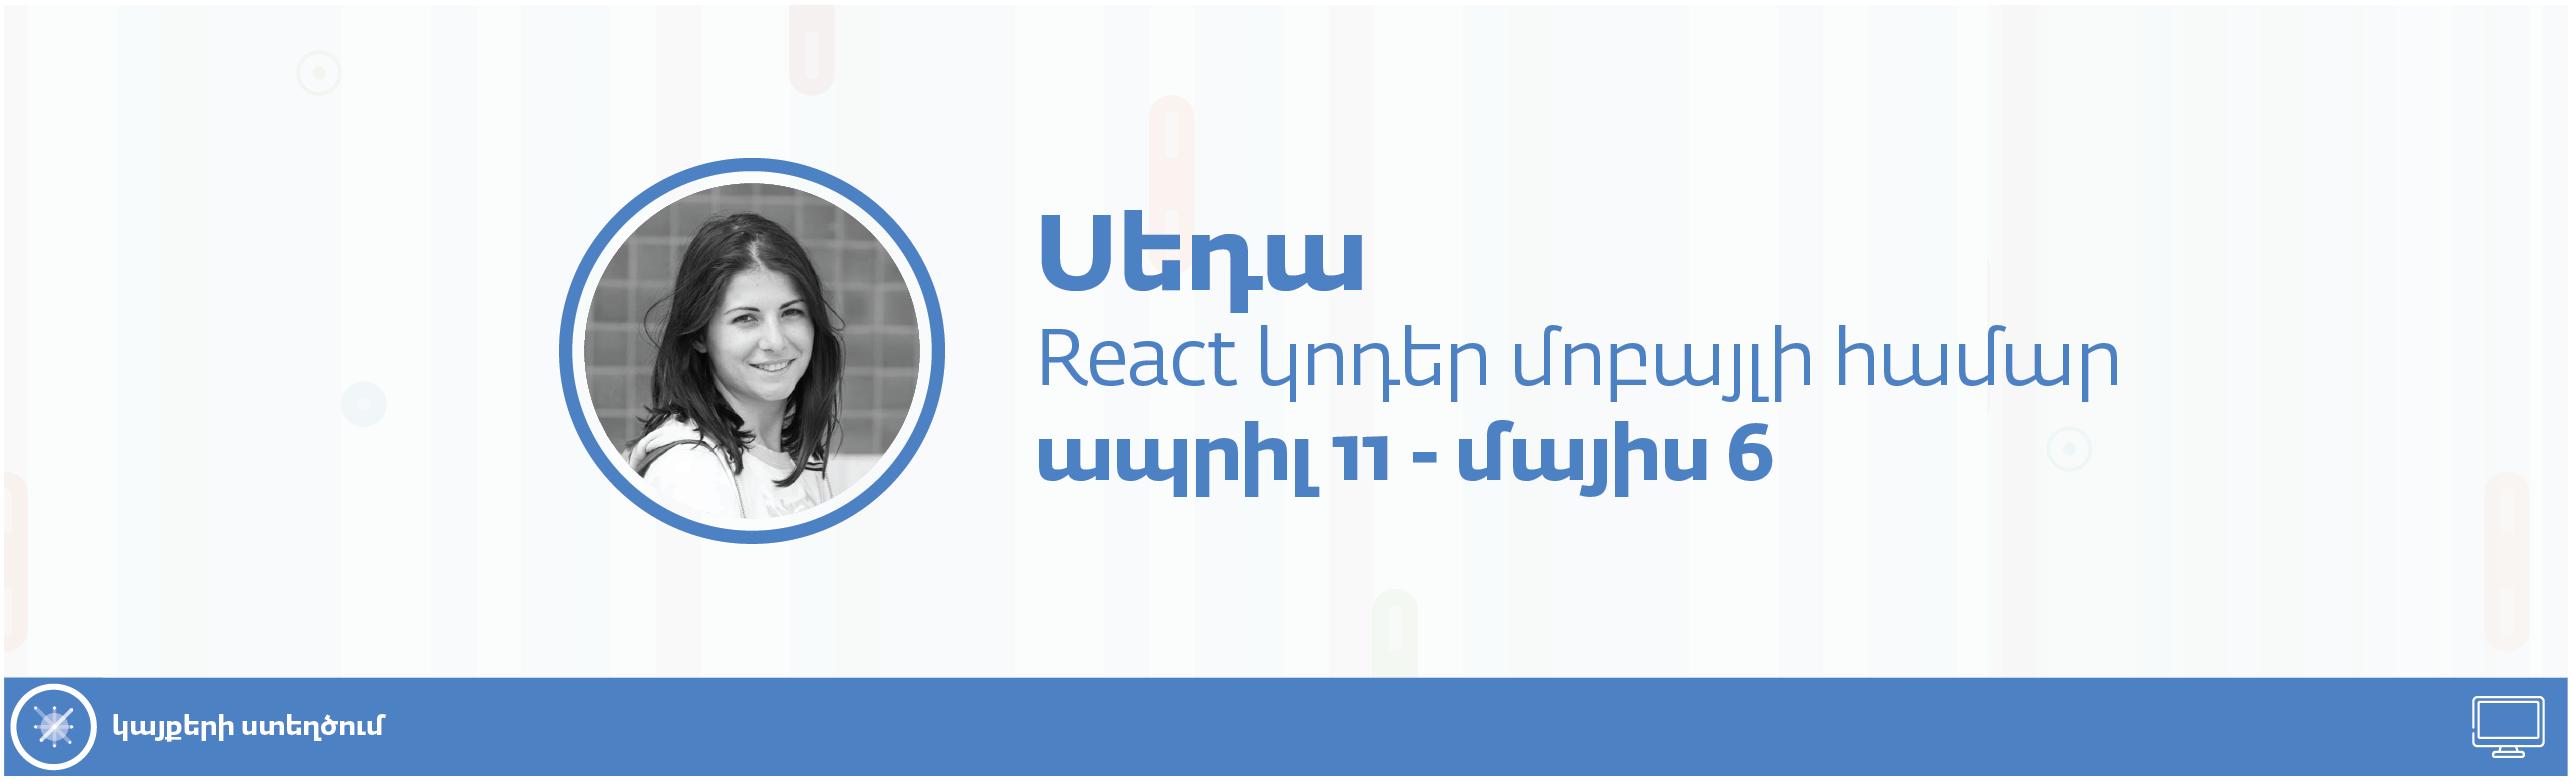 each page 09 - React կոդեր մոբայլի համար